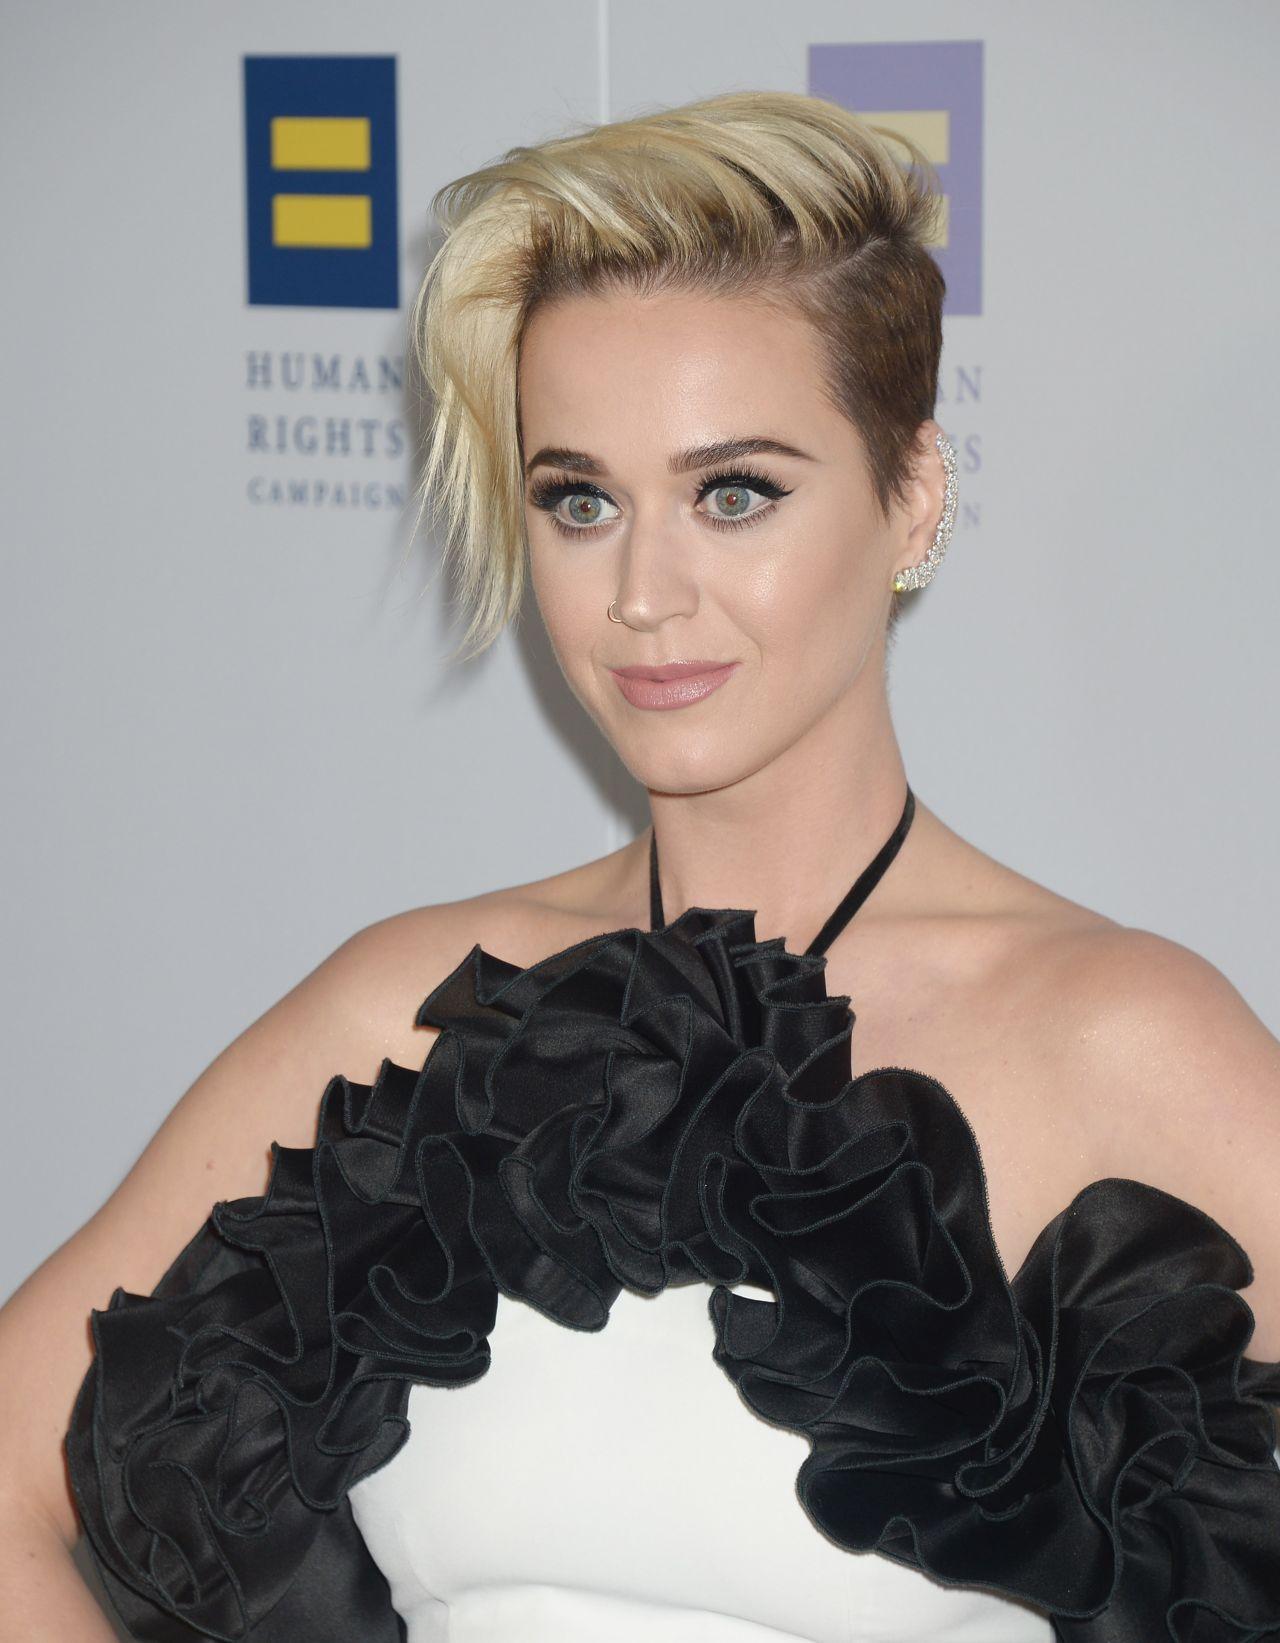 Katy Perry - Human Rig... Katy Perry